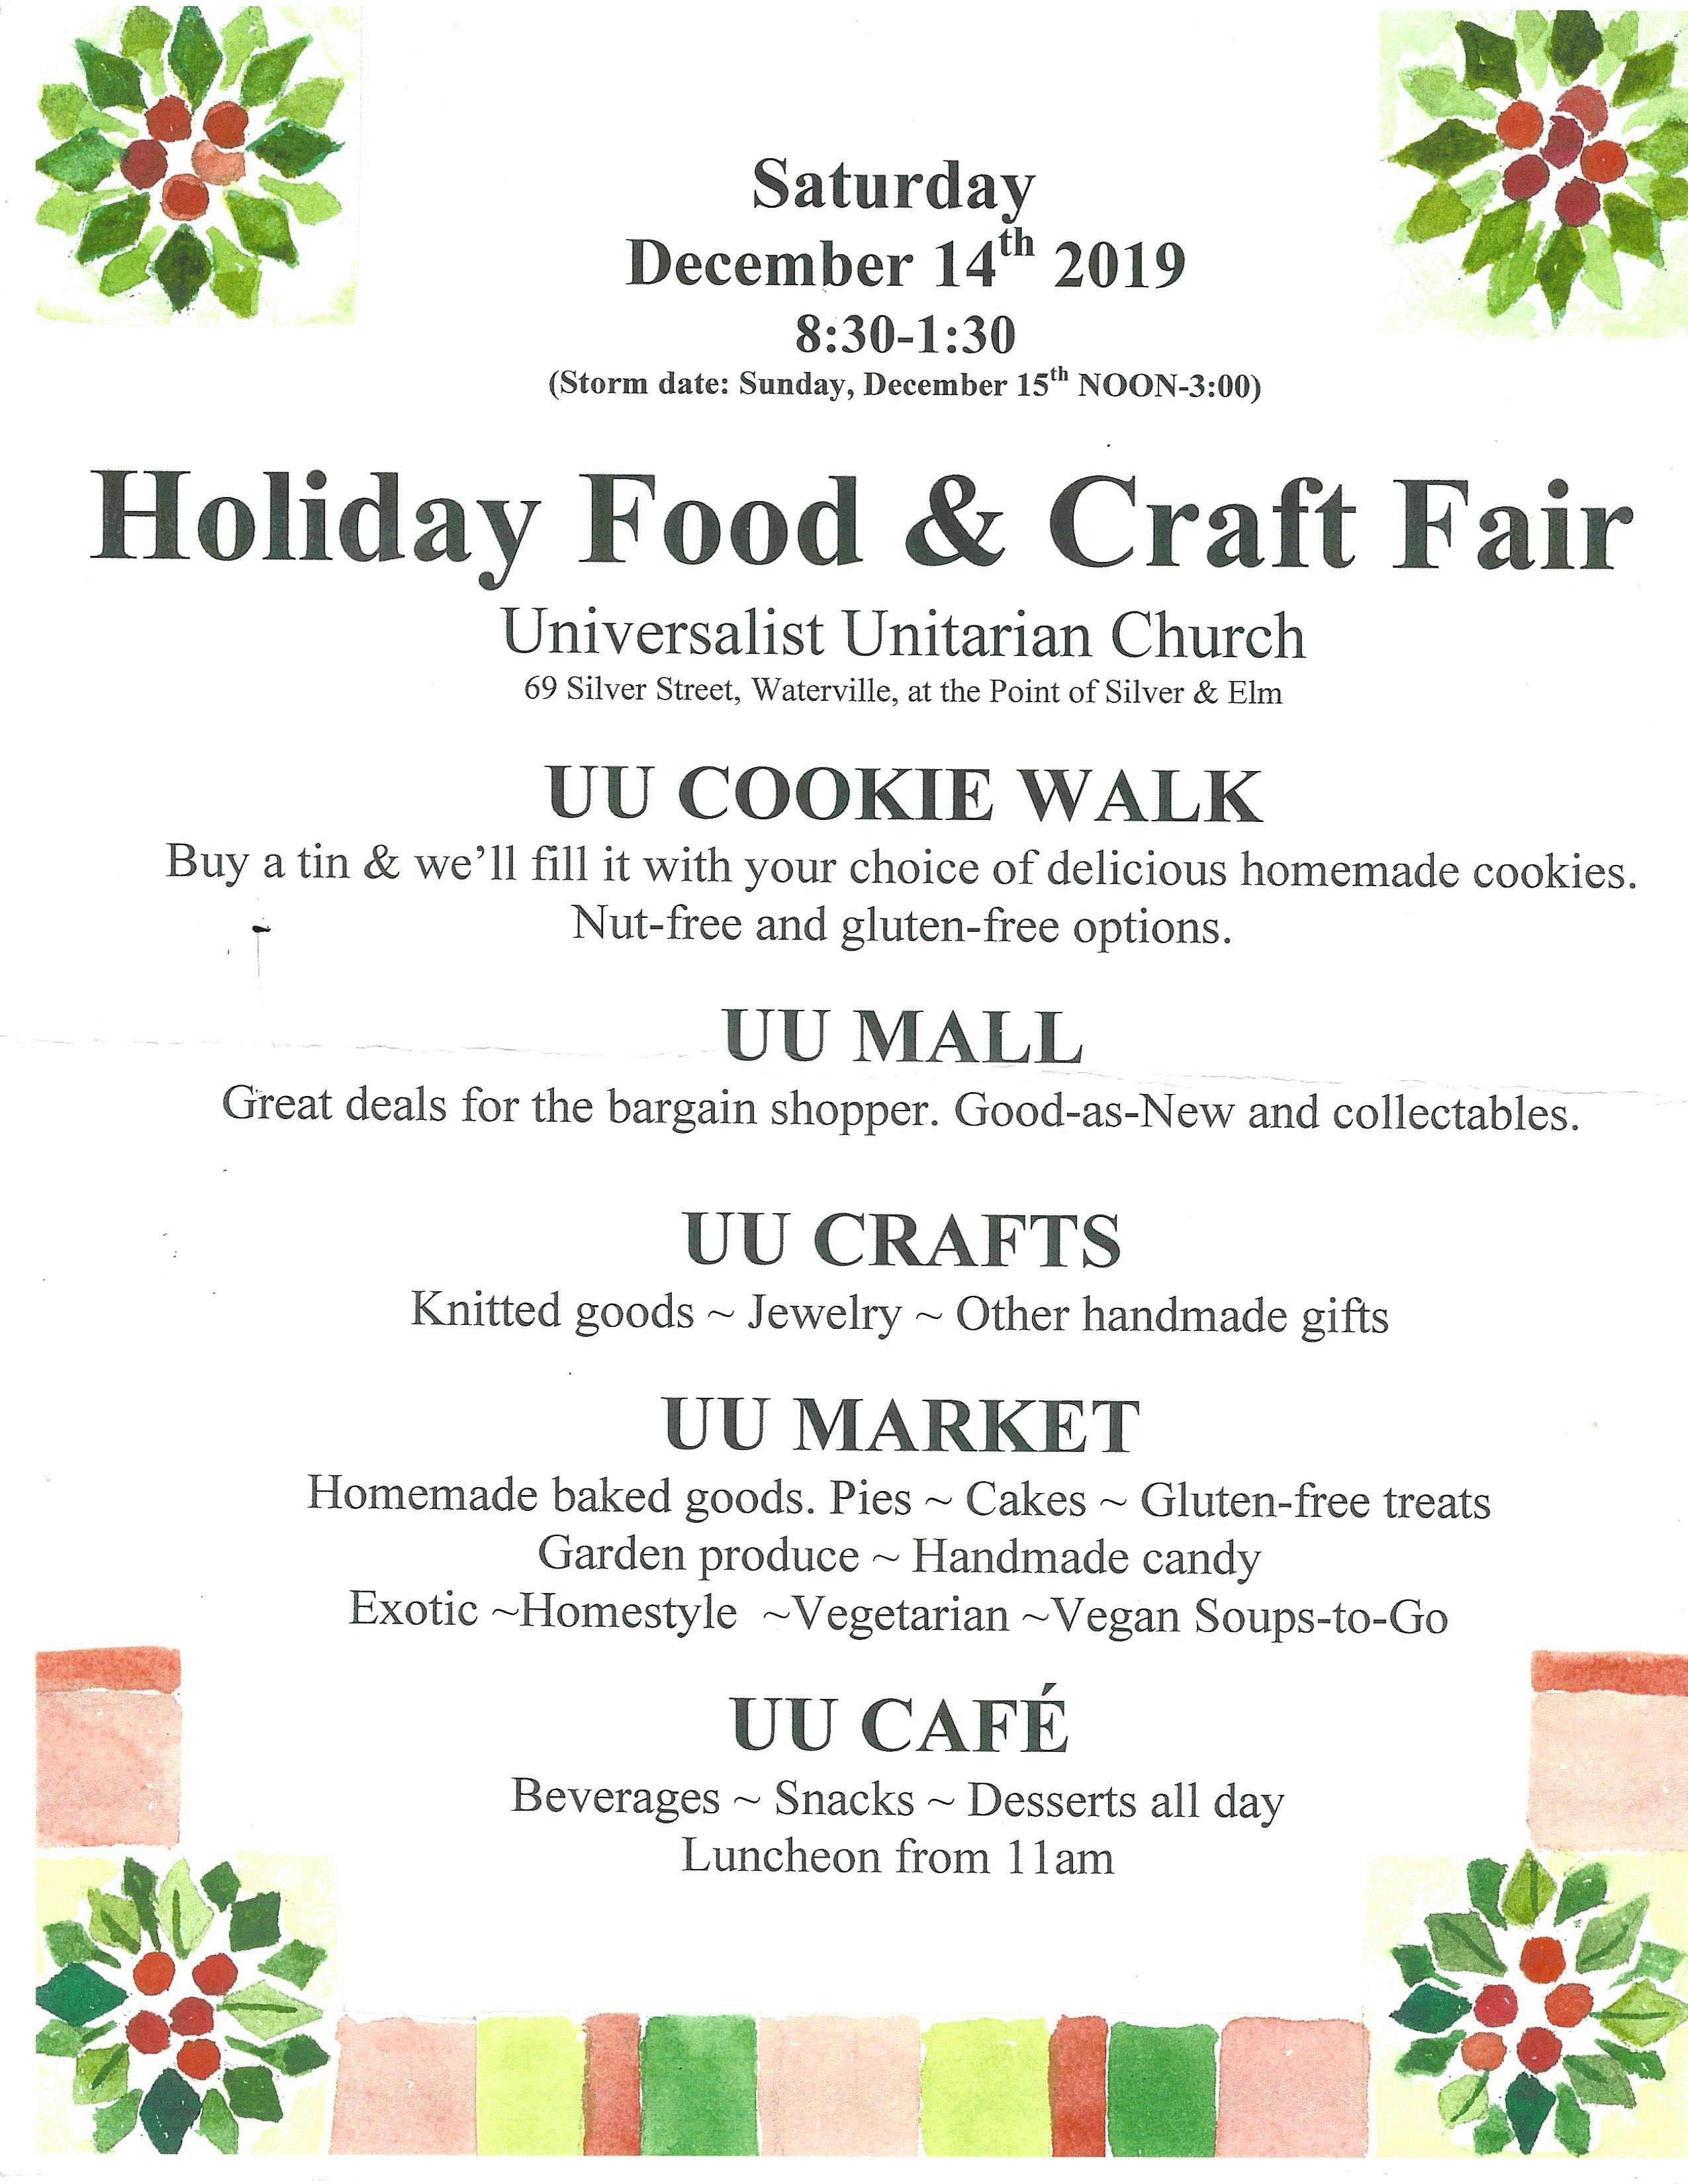 Cookie Walk, Crafts, Market, Cafe